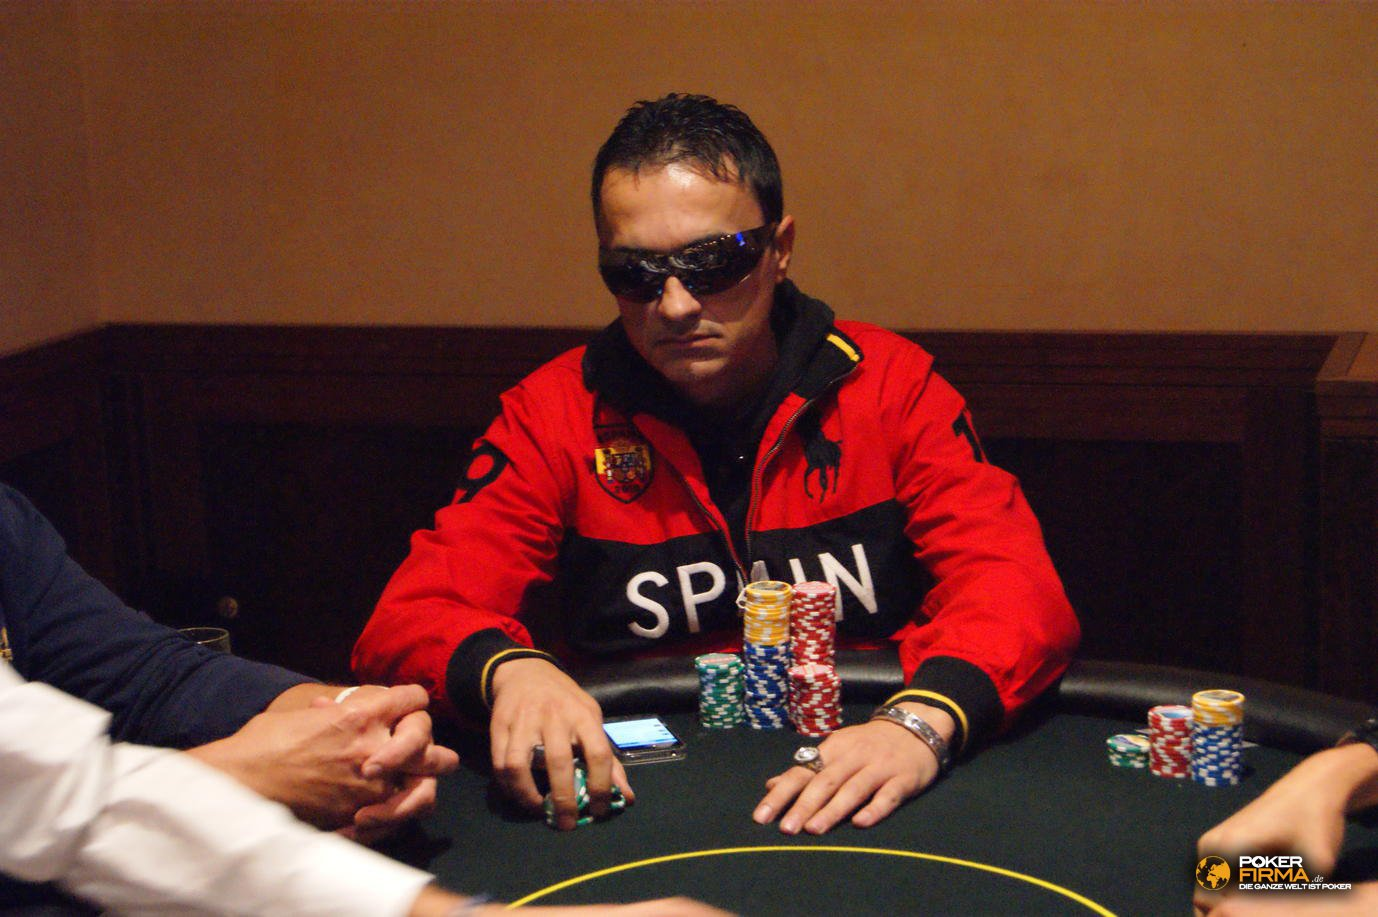 Poker_EM_2000_NLH_251011_Besim_Hot